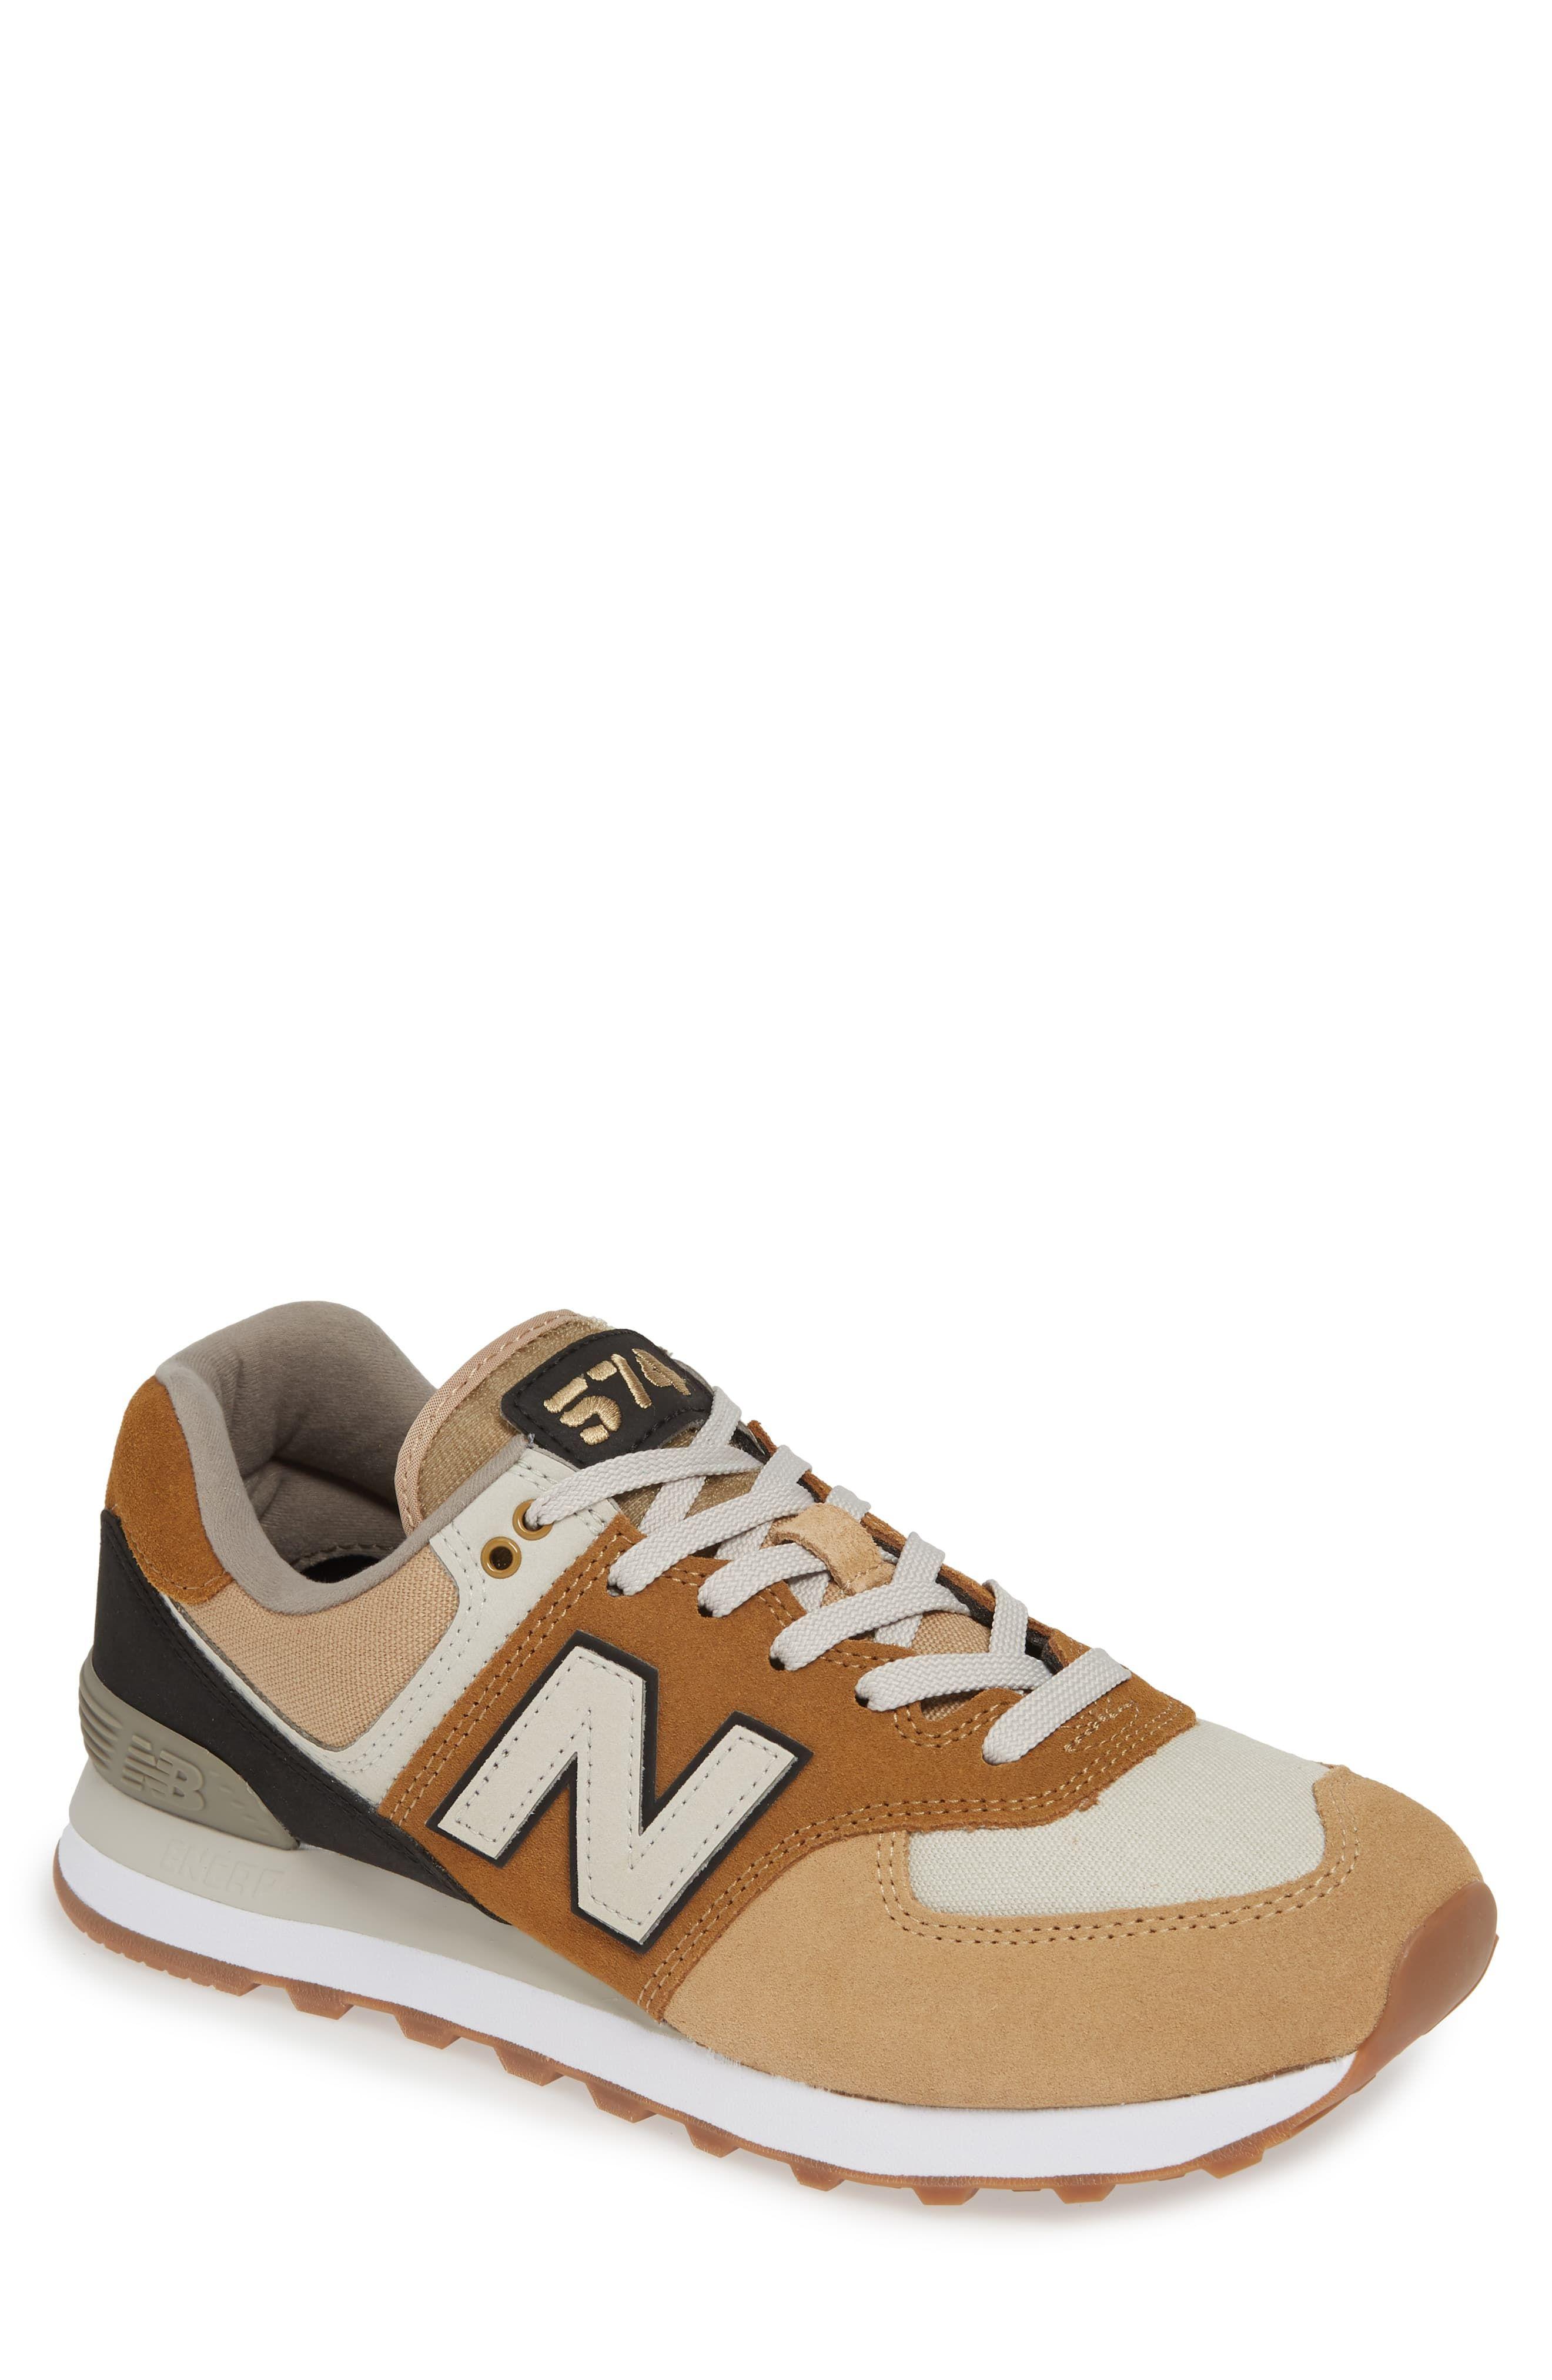 New Balance 574 Classic Sneaker (Men